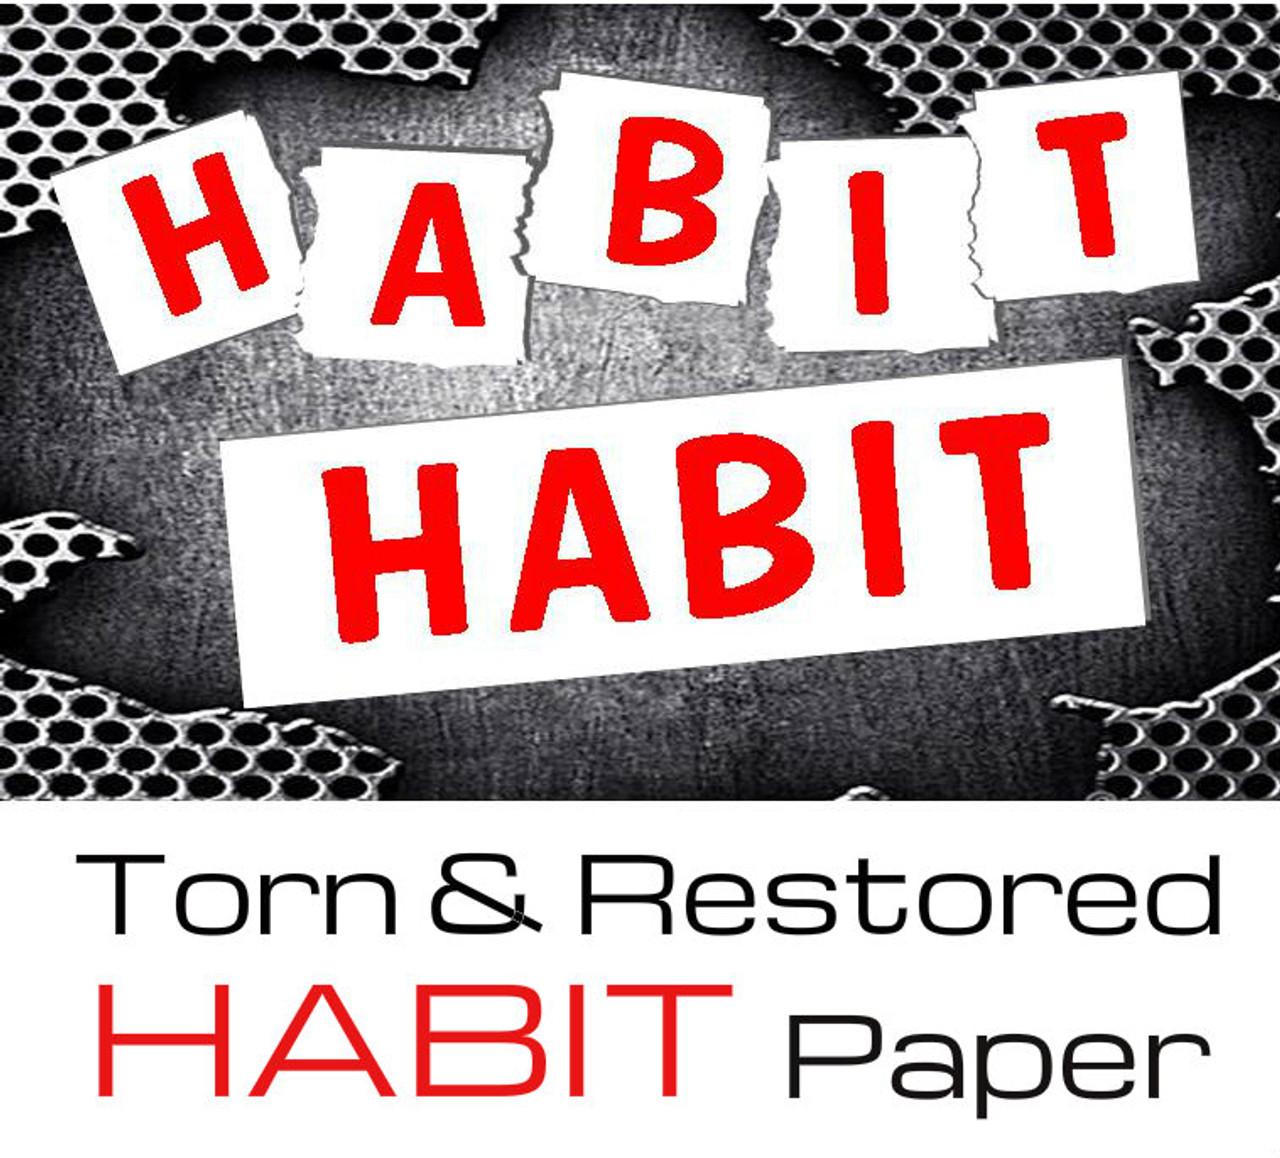 Habit paper tear Gospel Magic